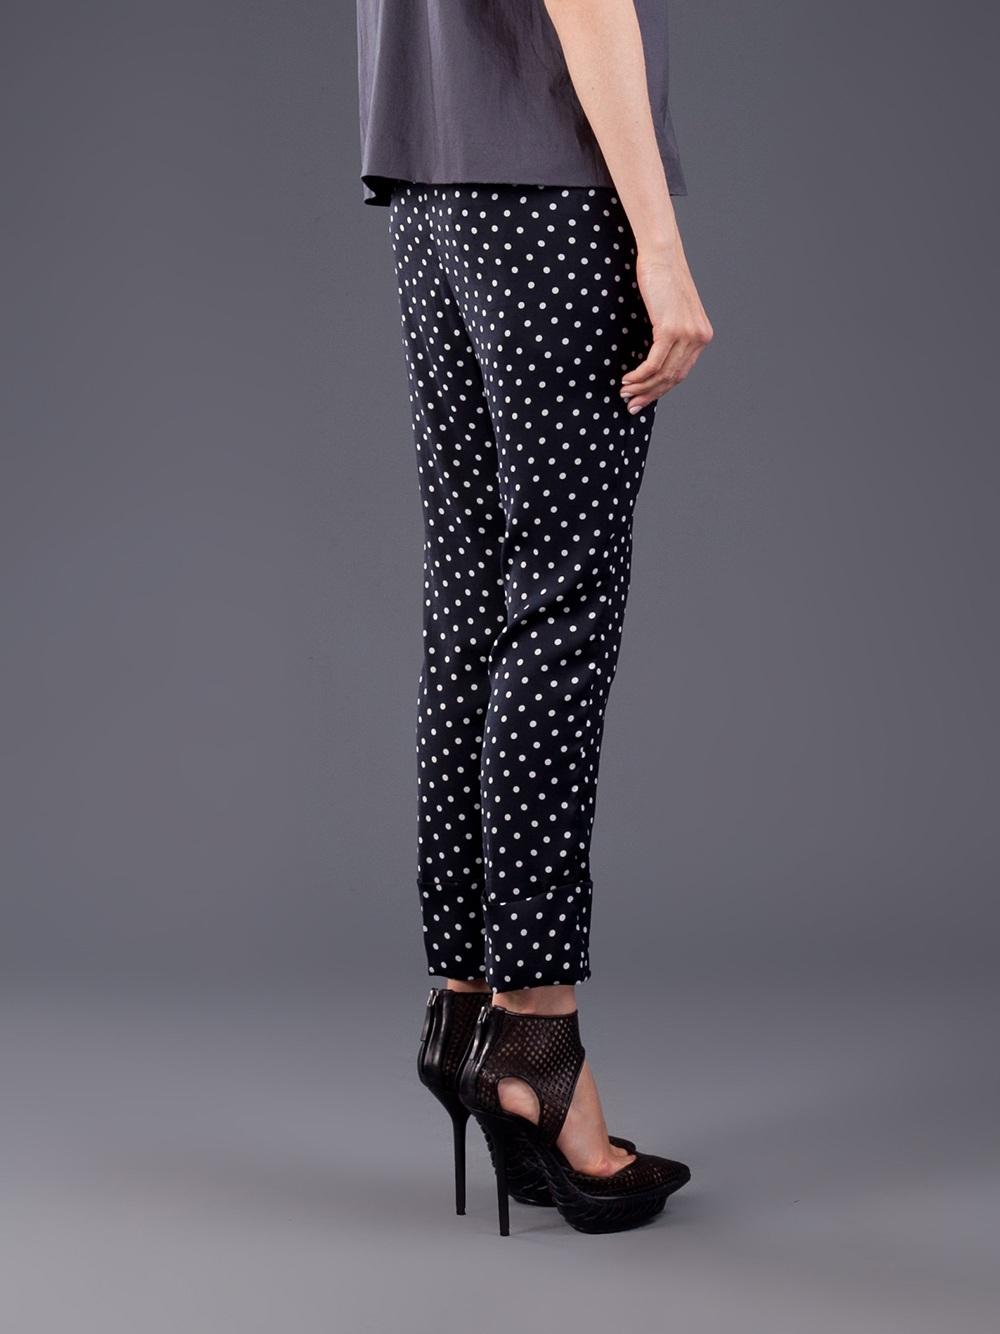 Cheap Sale Order Free Shipping Nicekicks Haider Ackermann polka dot trousers Cheap Popular UnXvQQOY7w